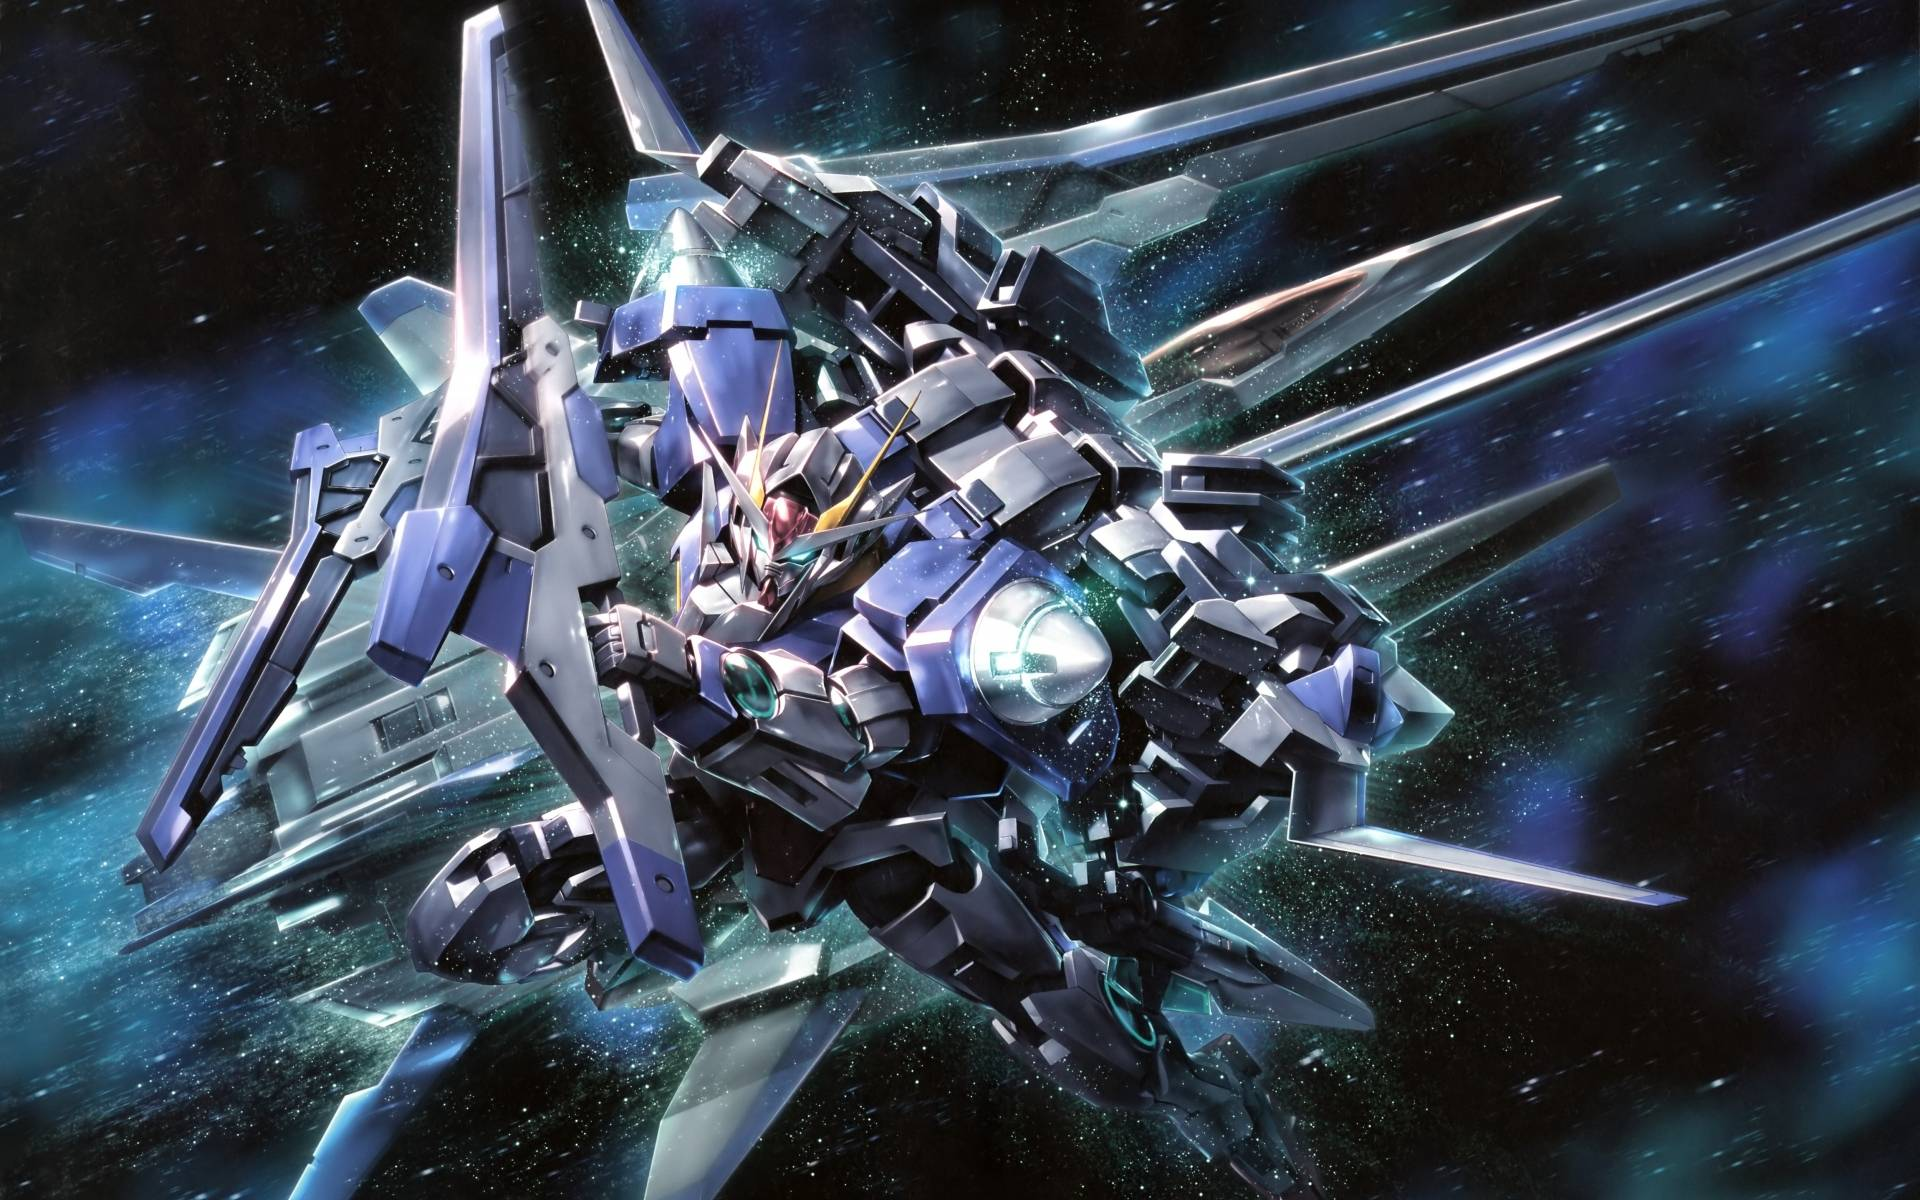 Gundam Hd Wallpapers Wallpaper Cave